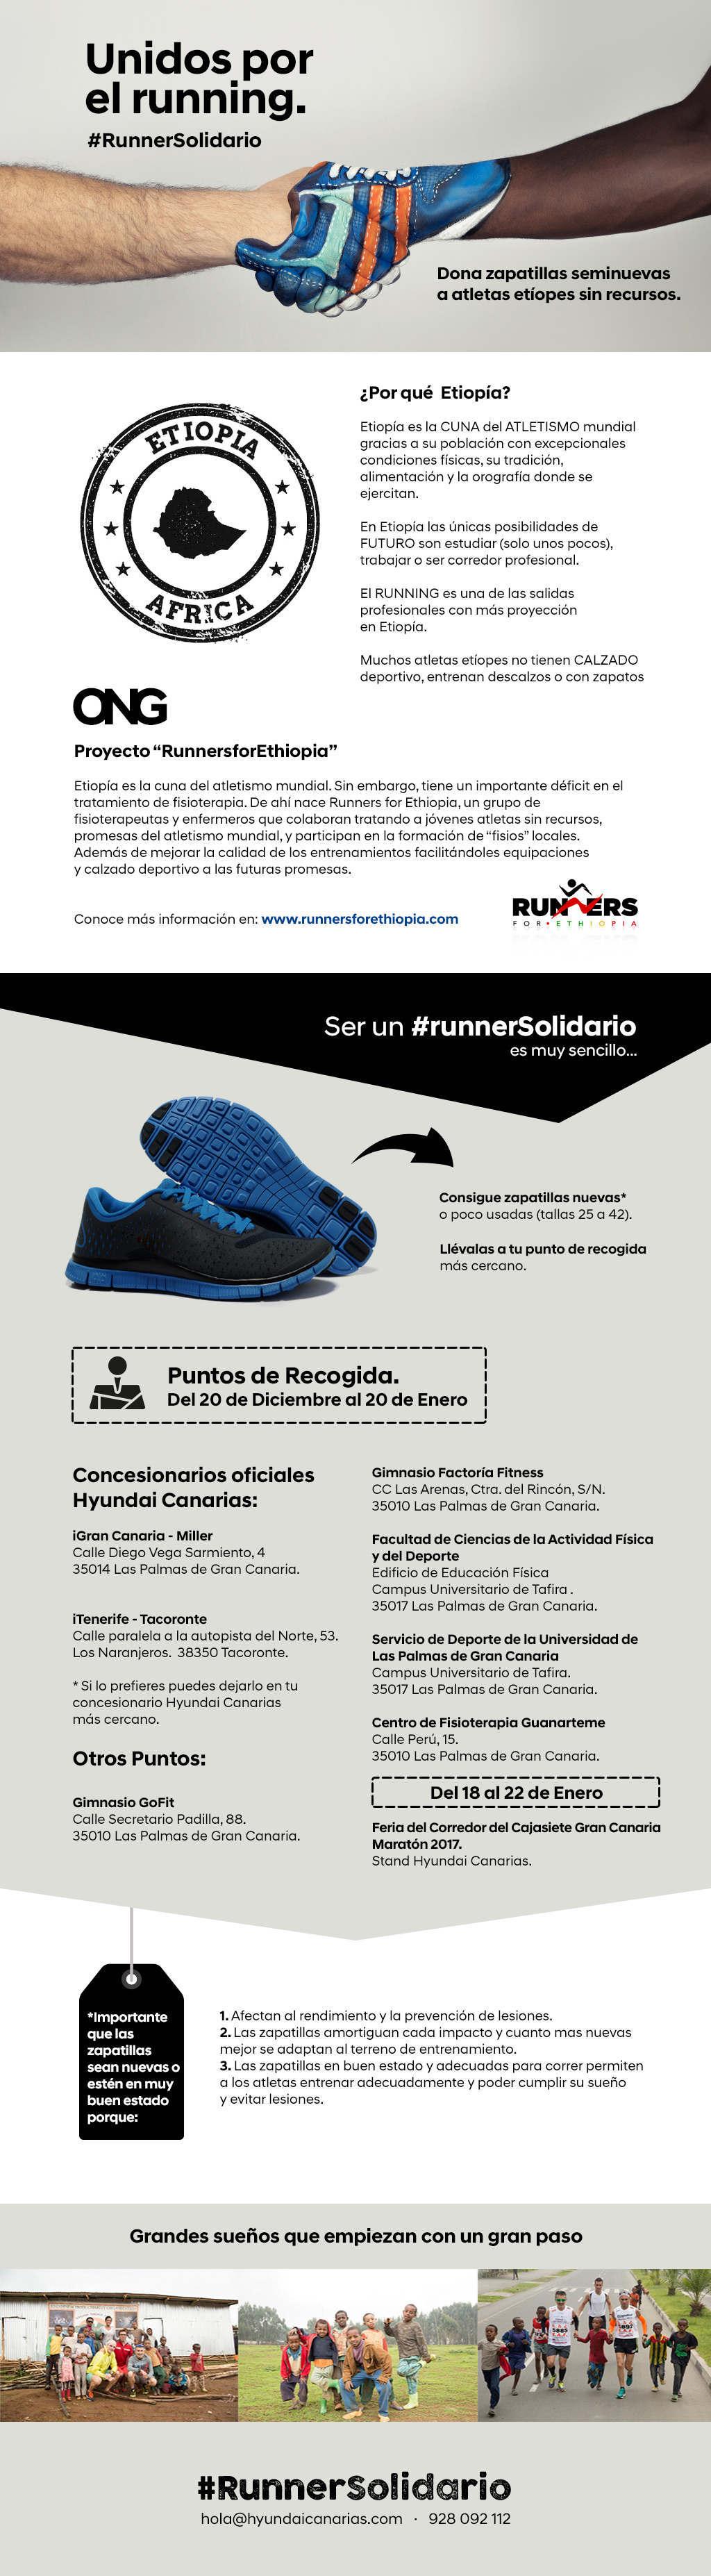 runners solidario canarias